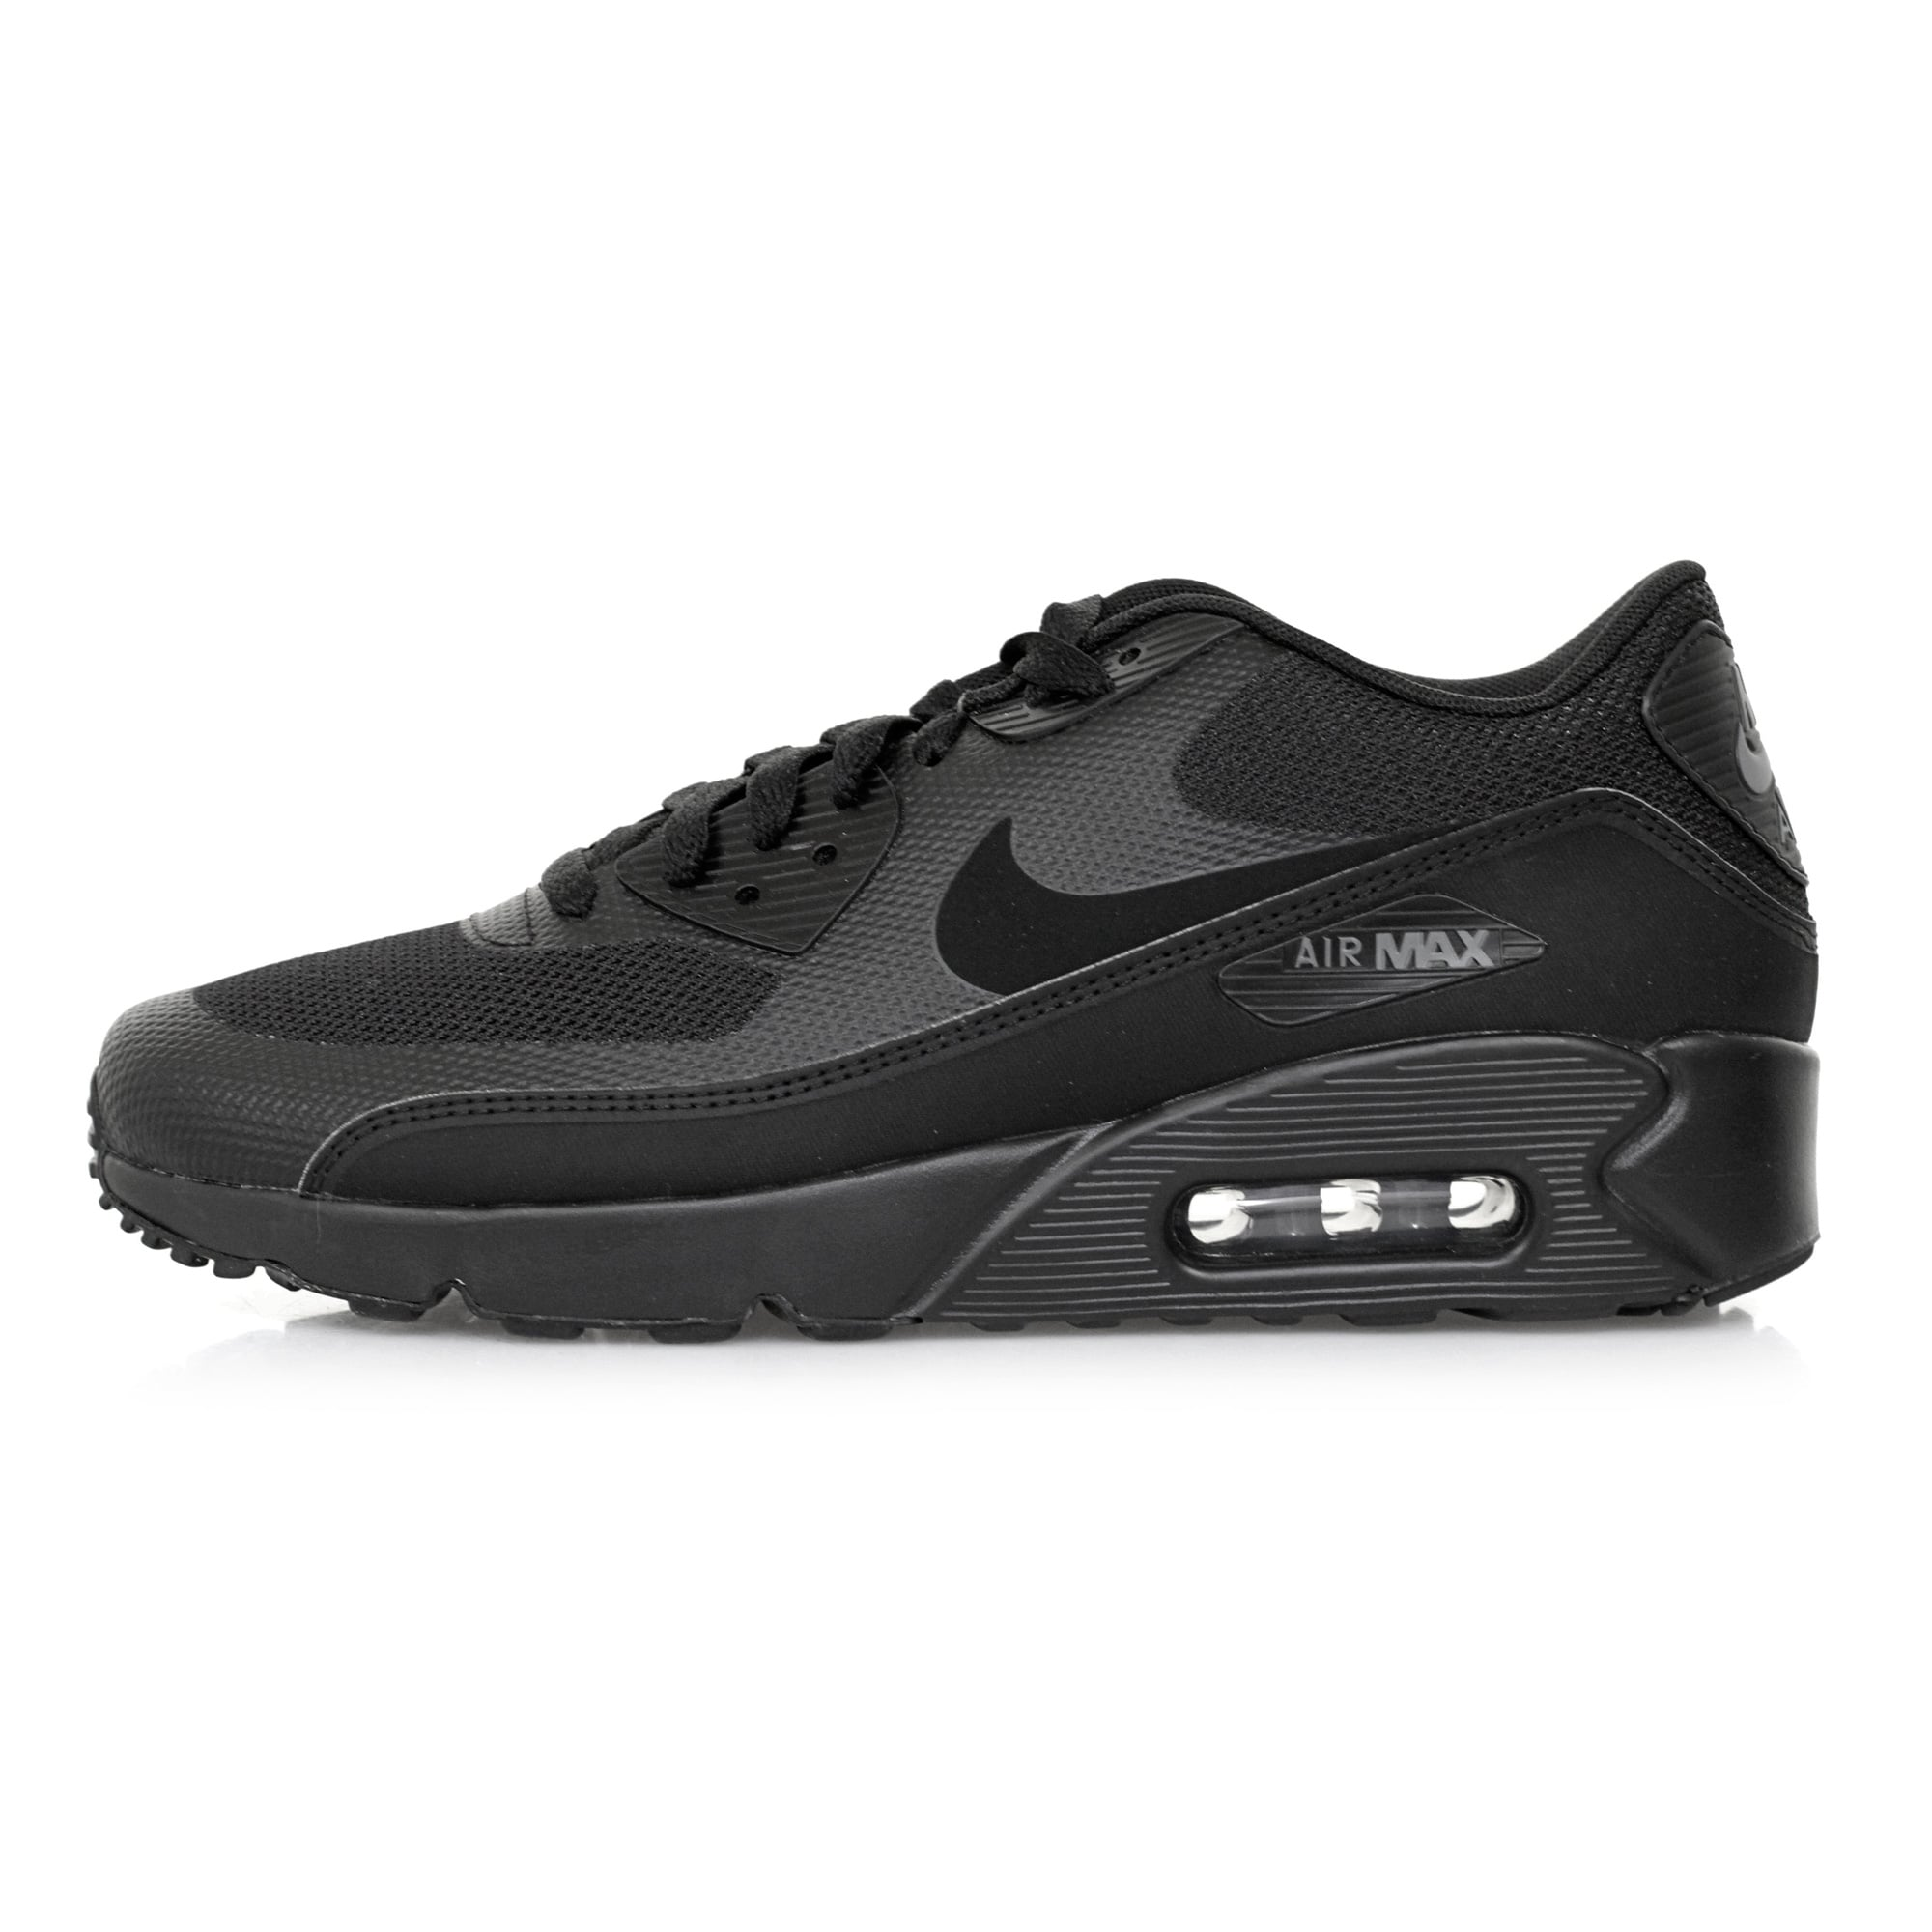 nike air max 90 ultra 2 0 essential black shoe. Black Bedroom Furniture Sets. Home Design Ideas